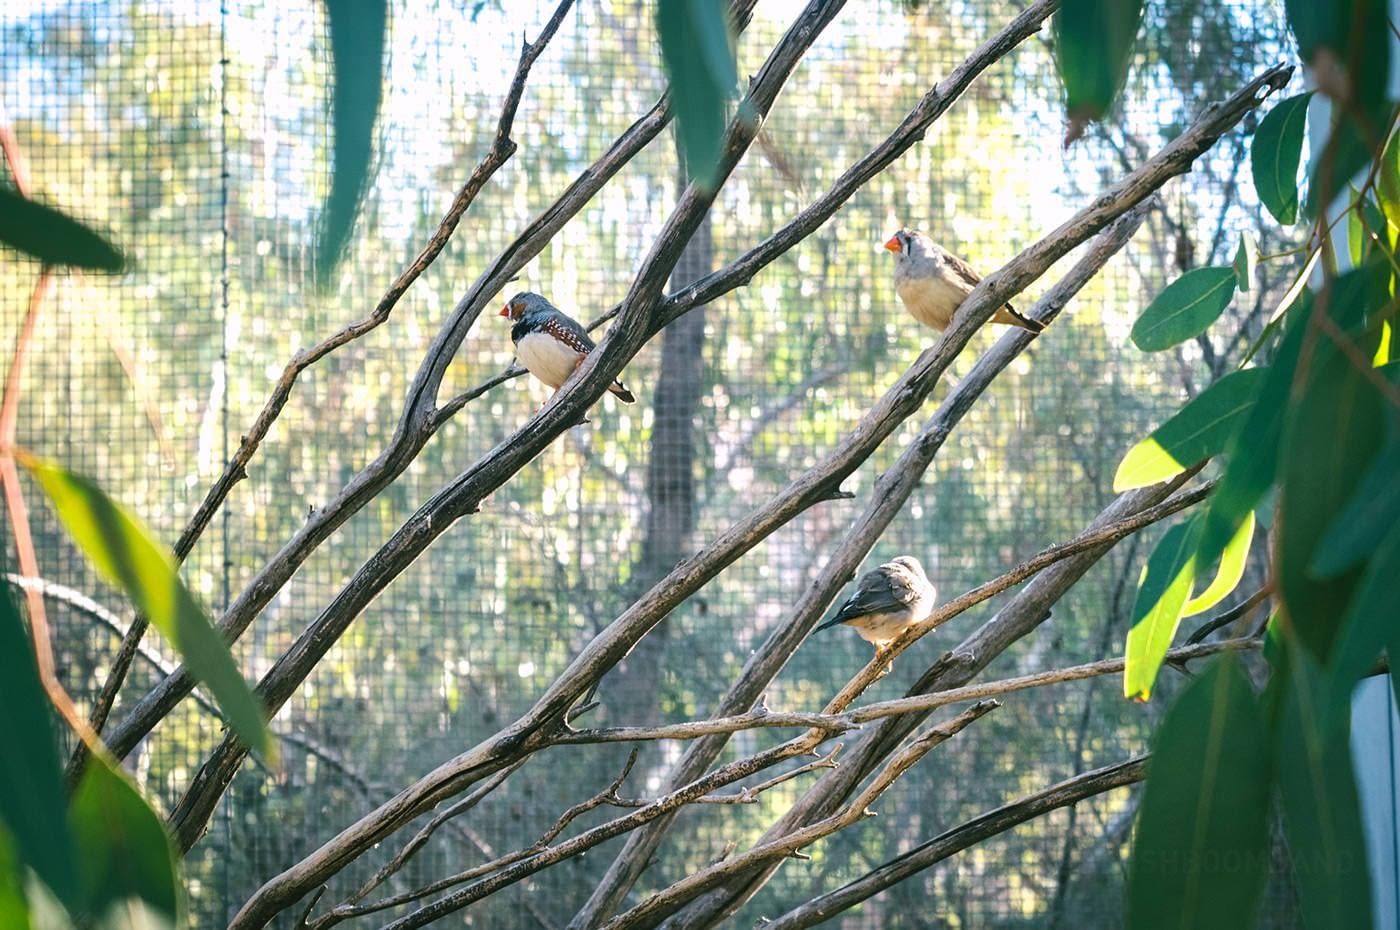 NT Australia - Zebra finch birds